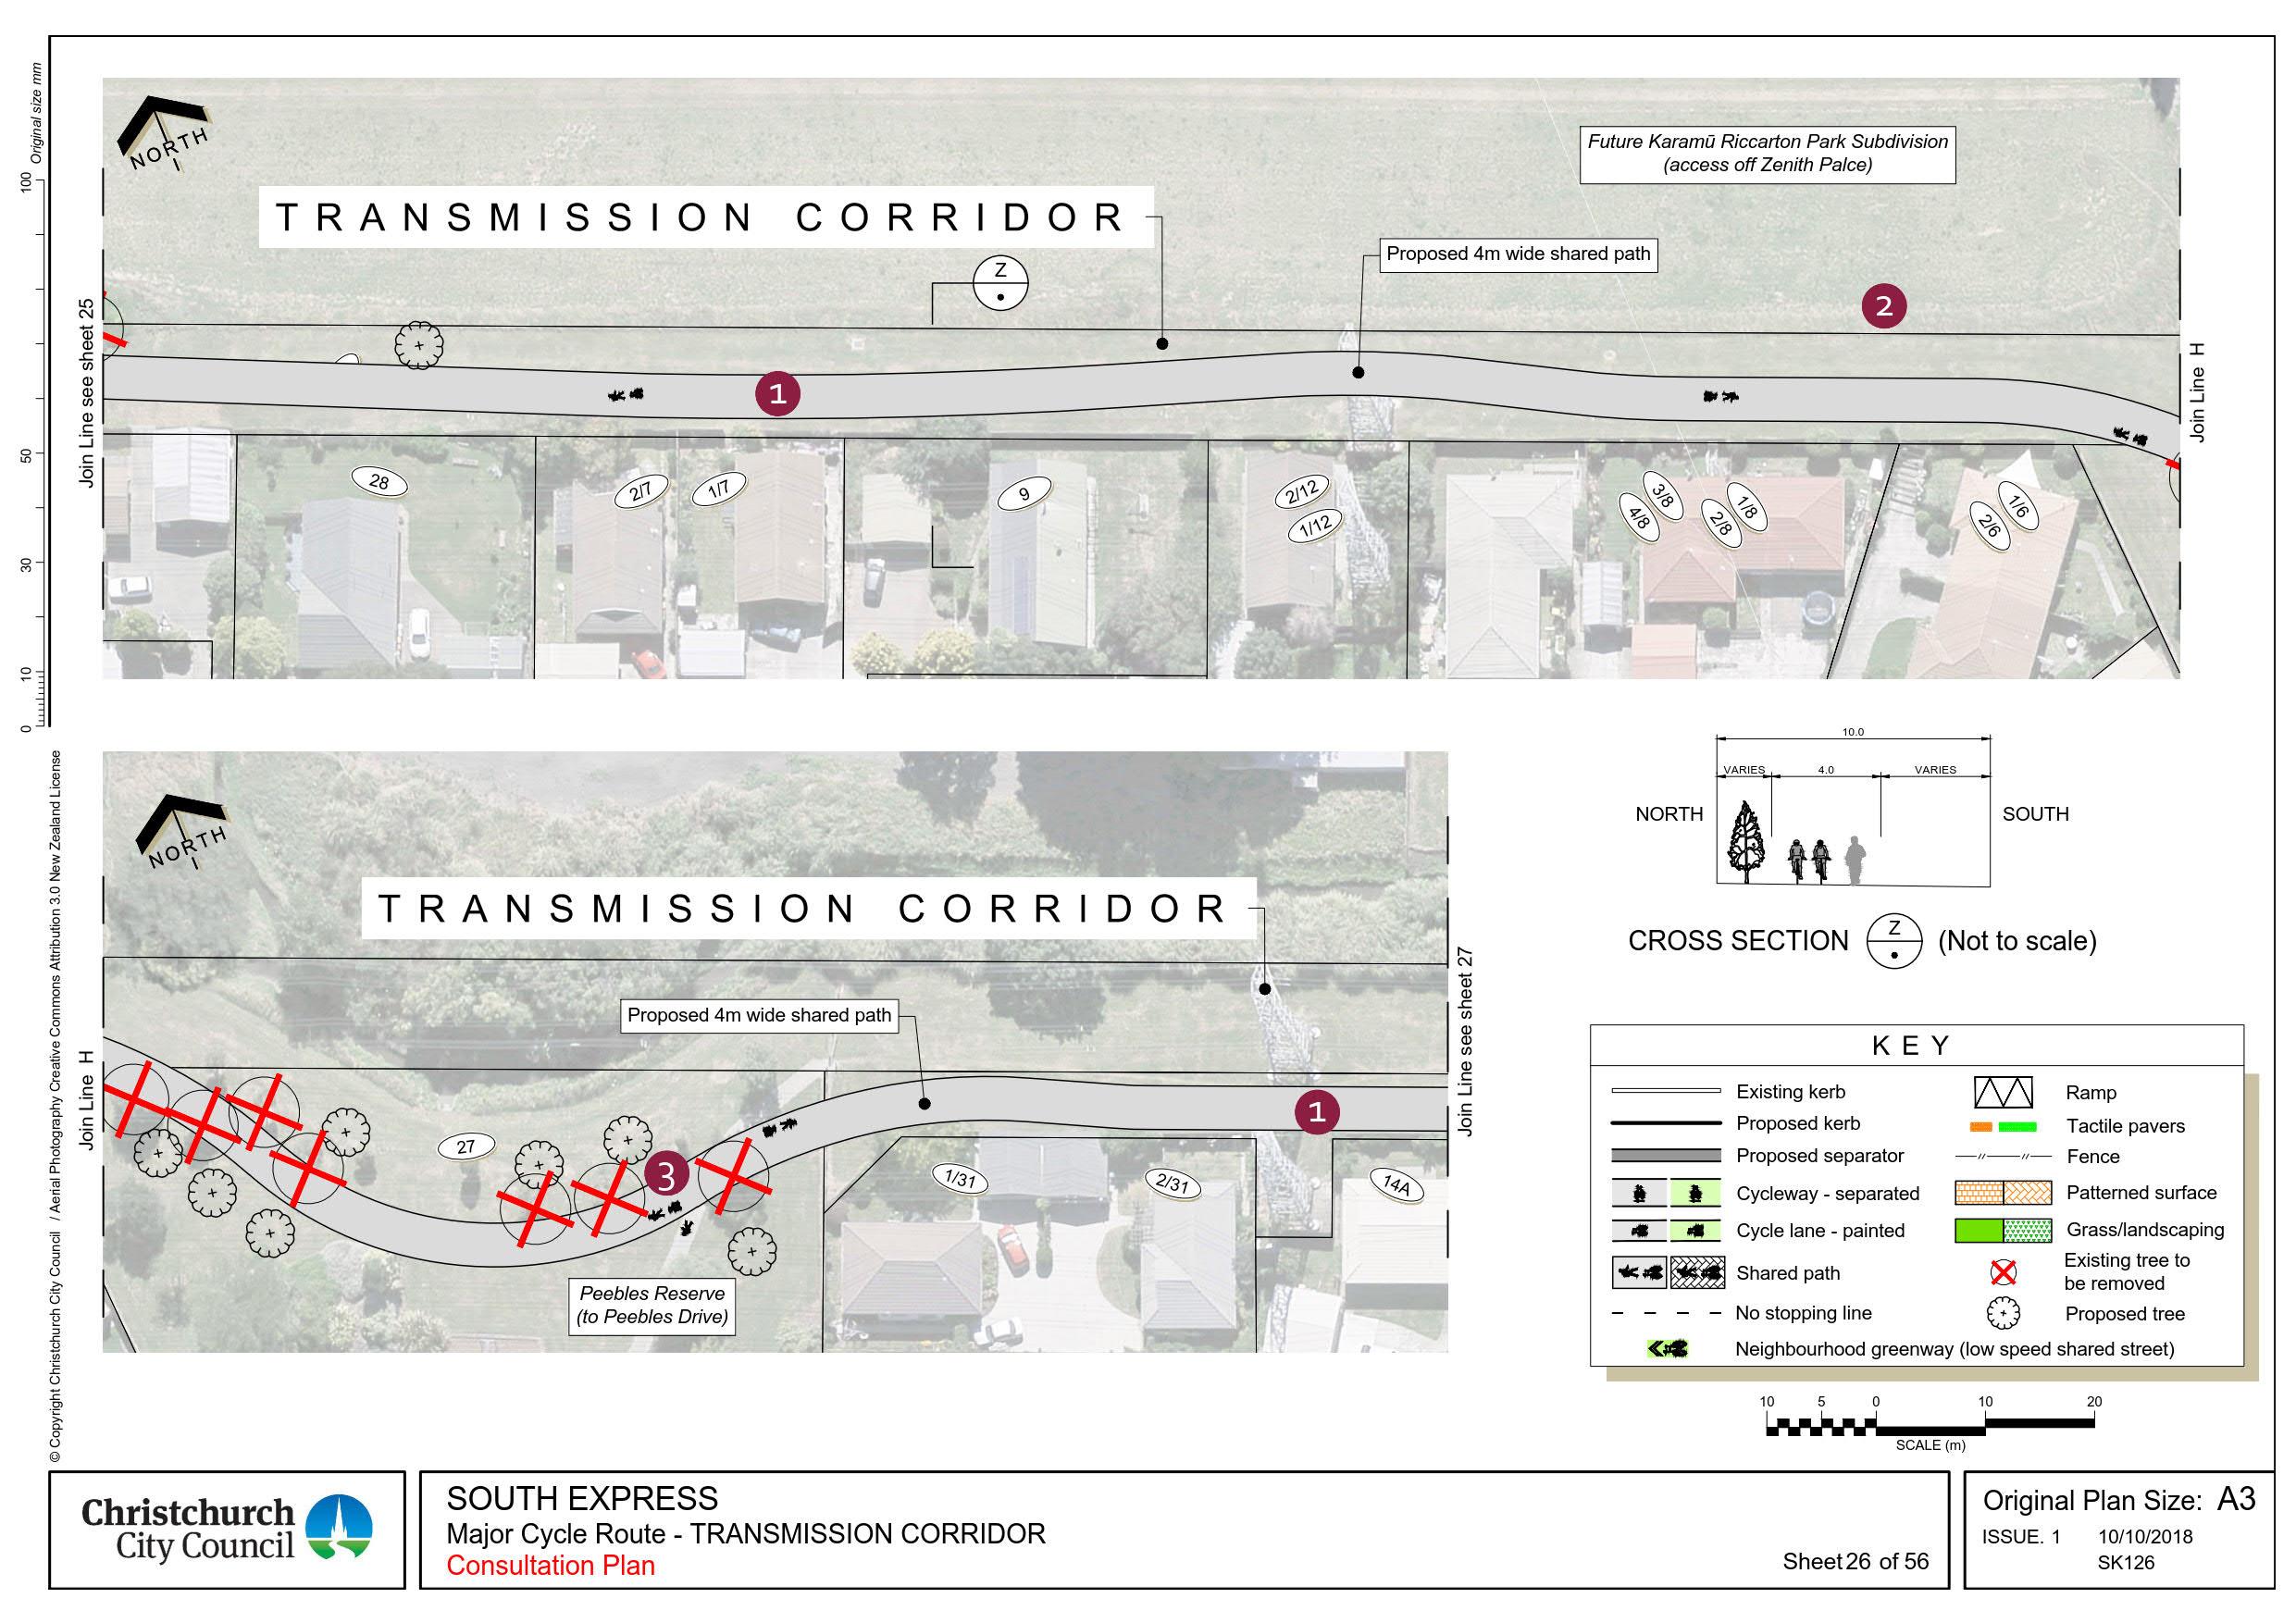 'Transmission Corridor